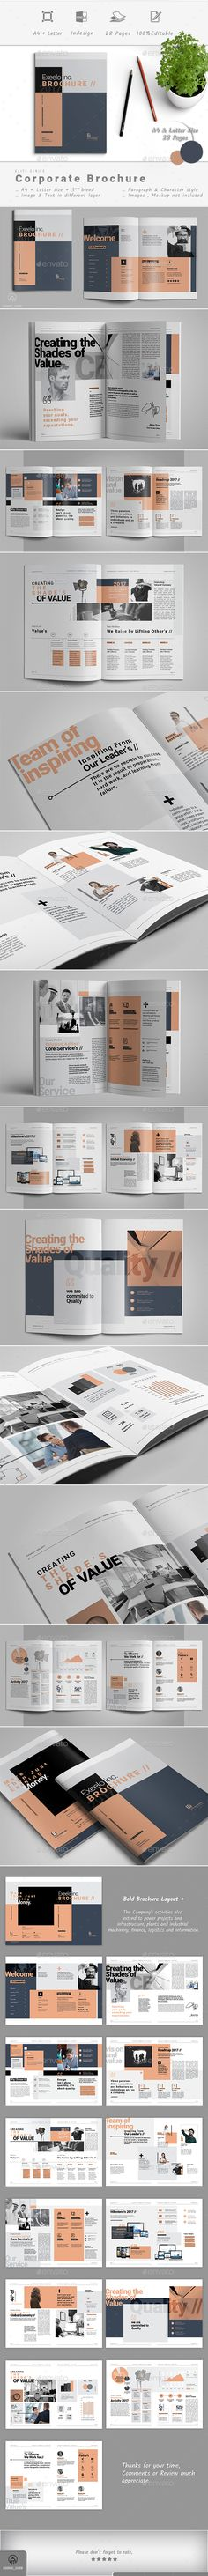 Brochure — InDesign INDD #brochure #report template